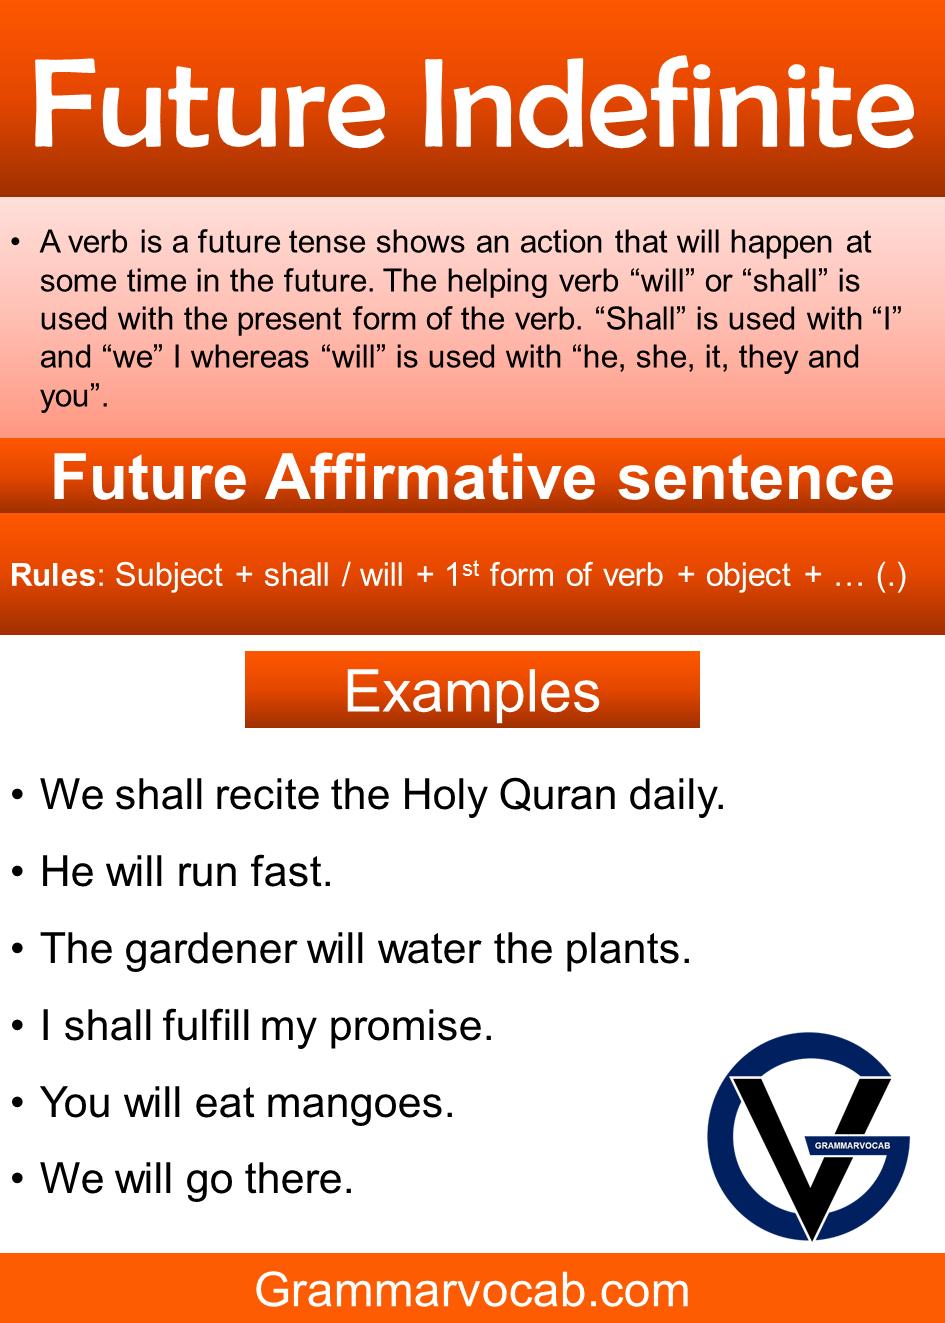 Future Indefinite Tense Structure